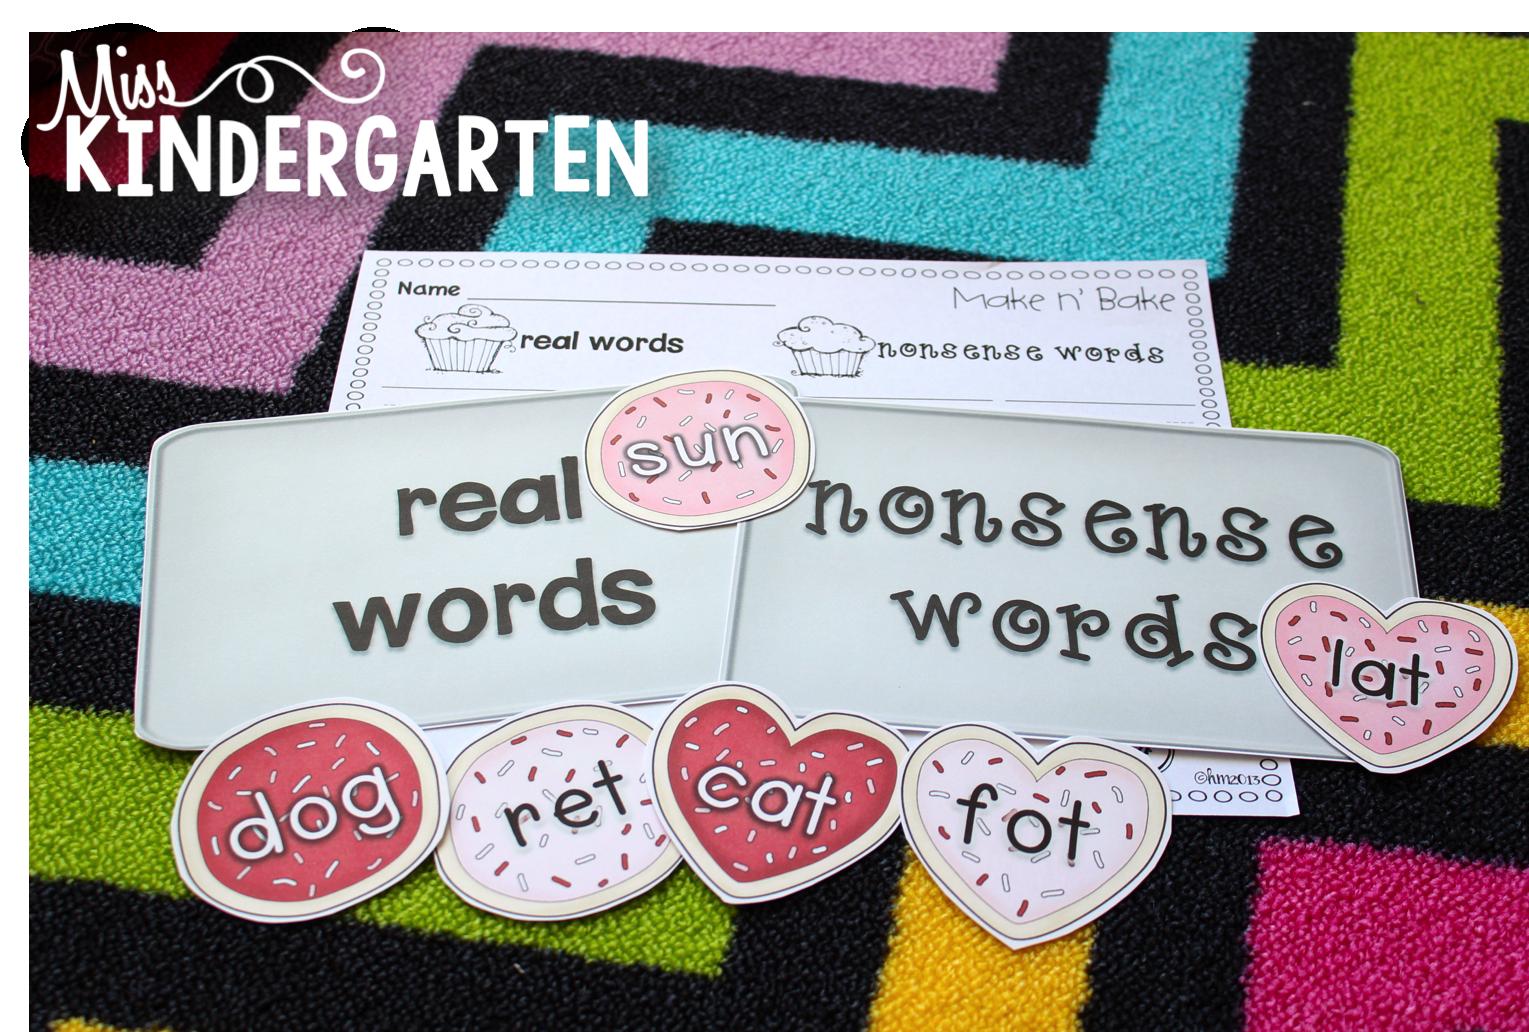 Miss Kindergarten Make N Bake Real And Nonsense Word